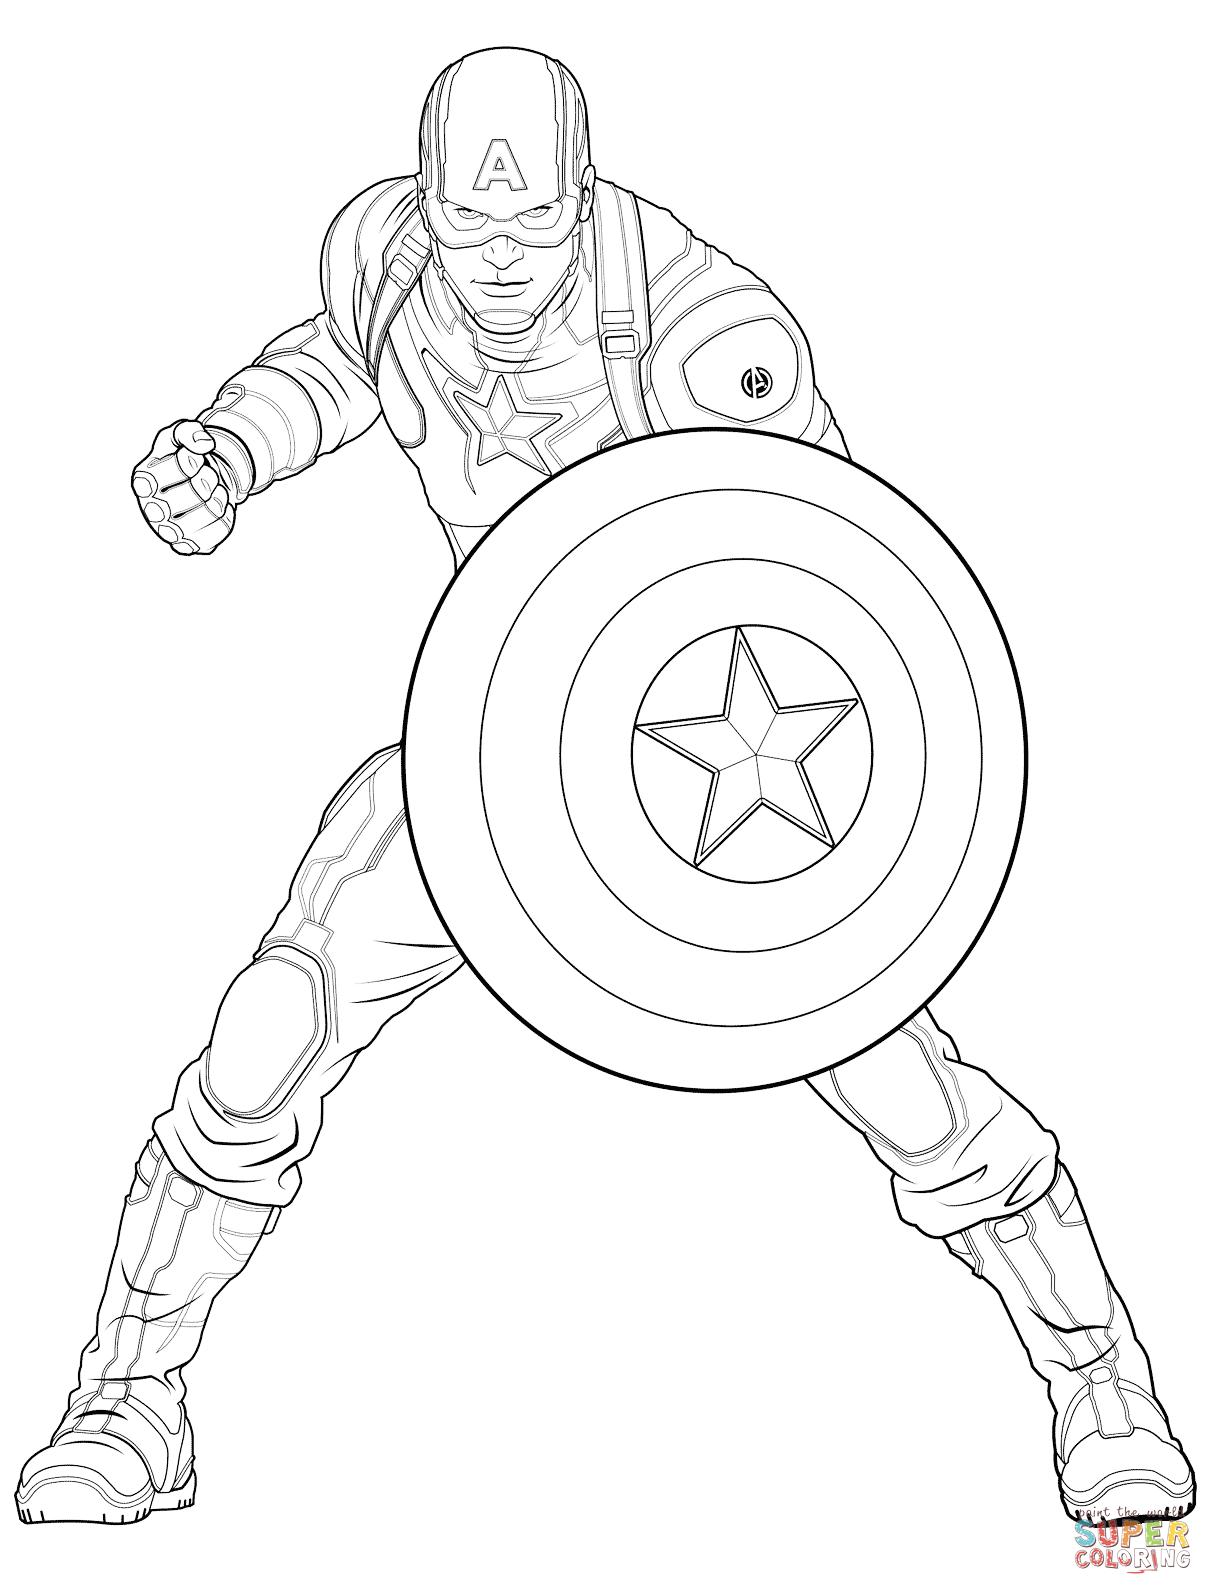 Avengers Captain America | Super Coloring | Kifestå?